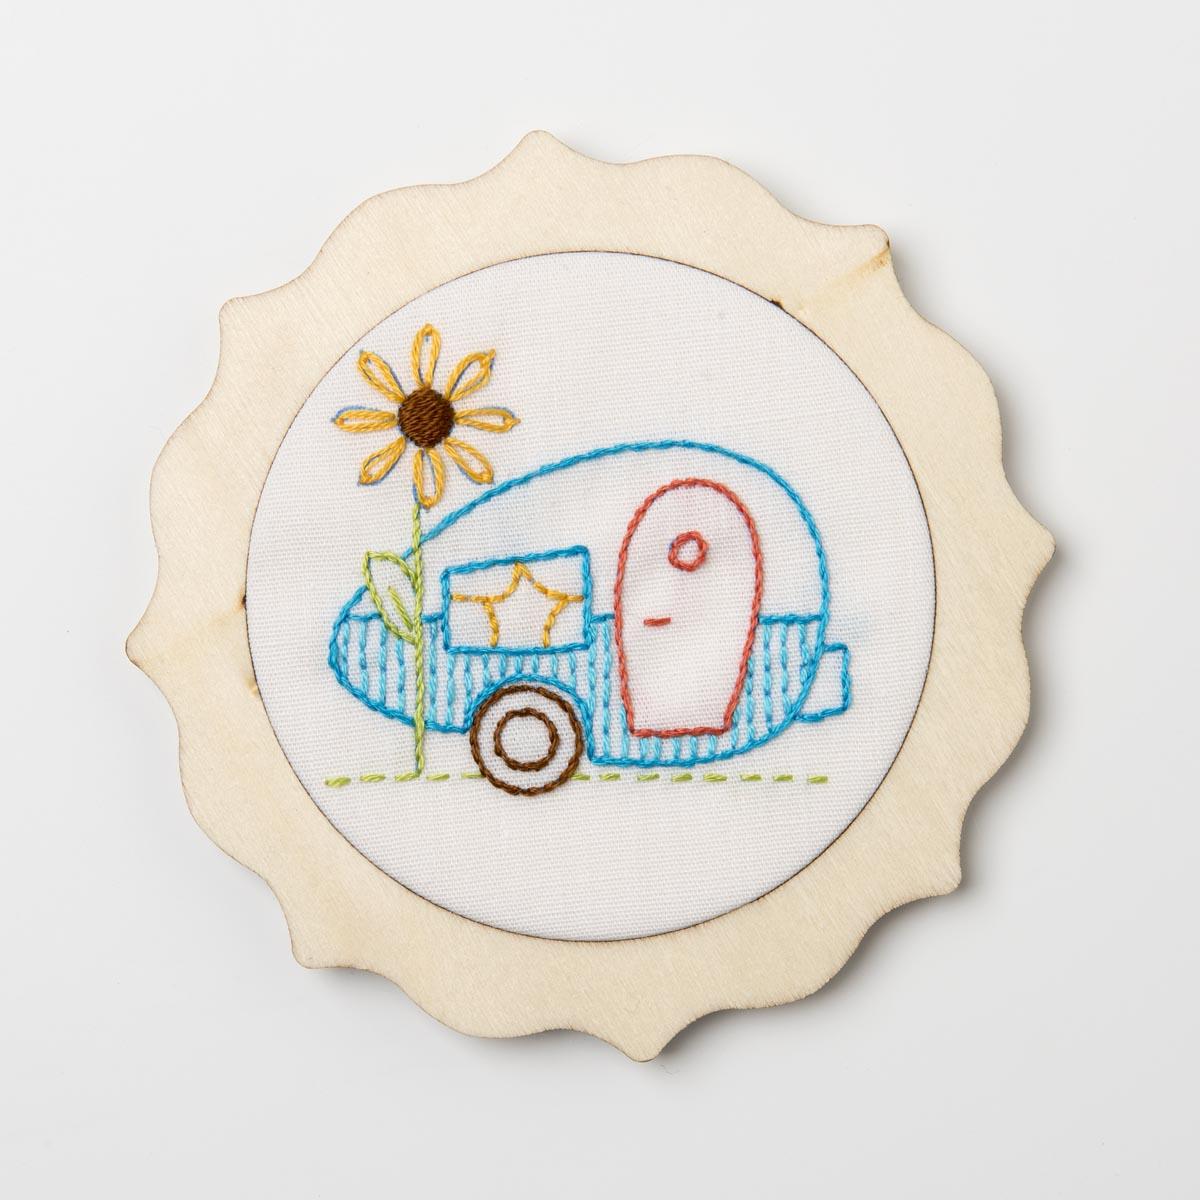 Bucilla ® My 1st Stitch™ - Stamped Embroidery Kits - Camper